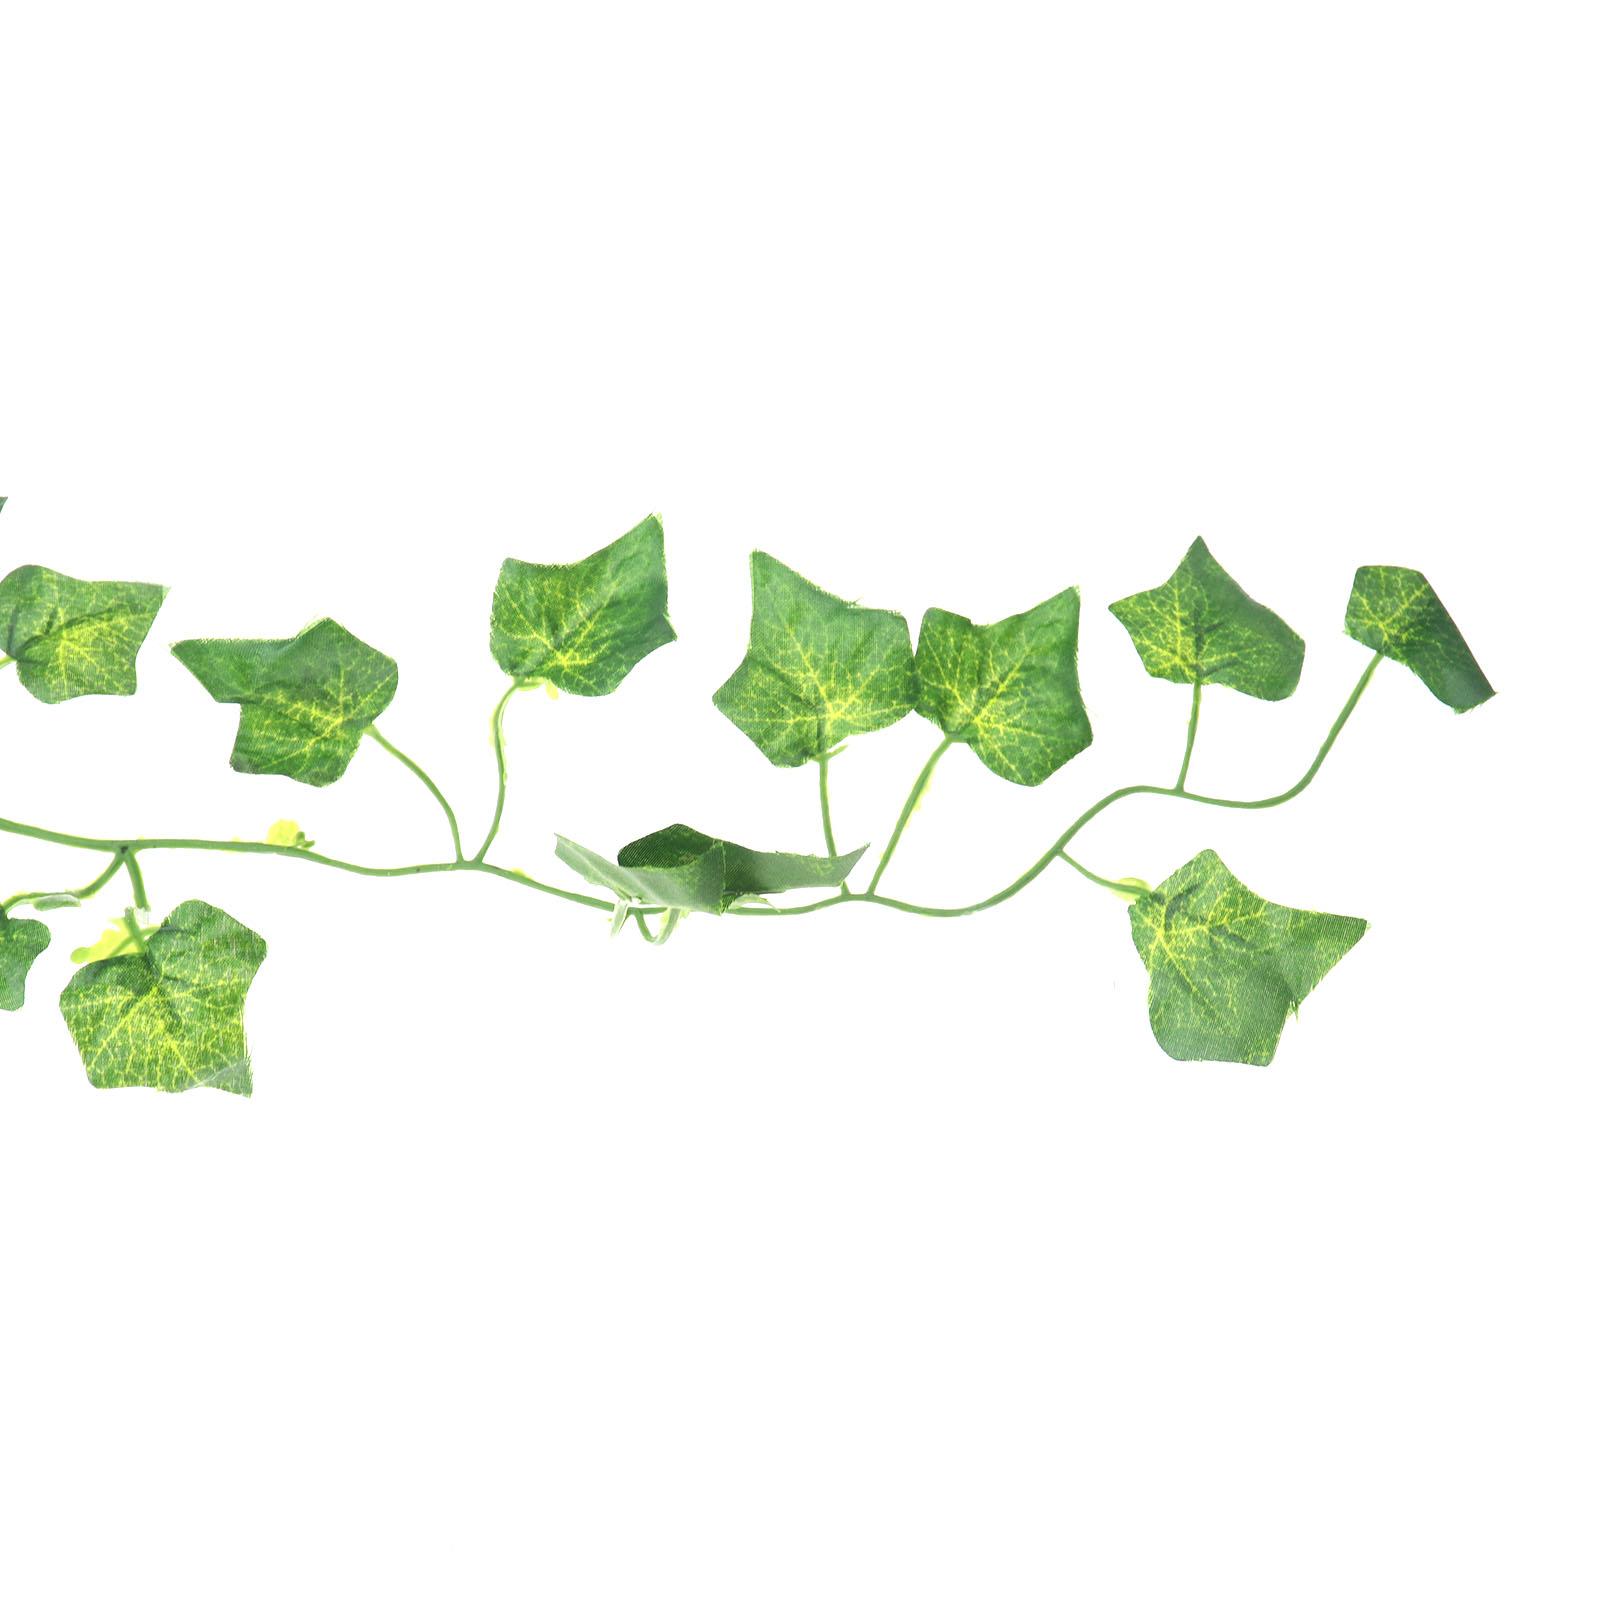 Home Decor 7x 2m Artificial Ivy Vine Fake Foliage Flower Hanging Leaf Garland Plant Party Home Garden Mbln Org